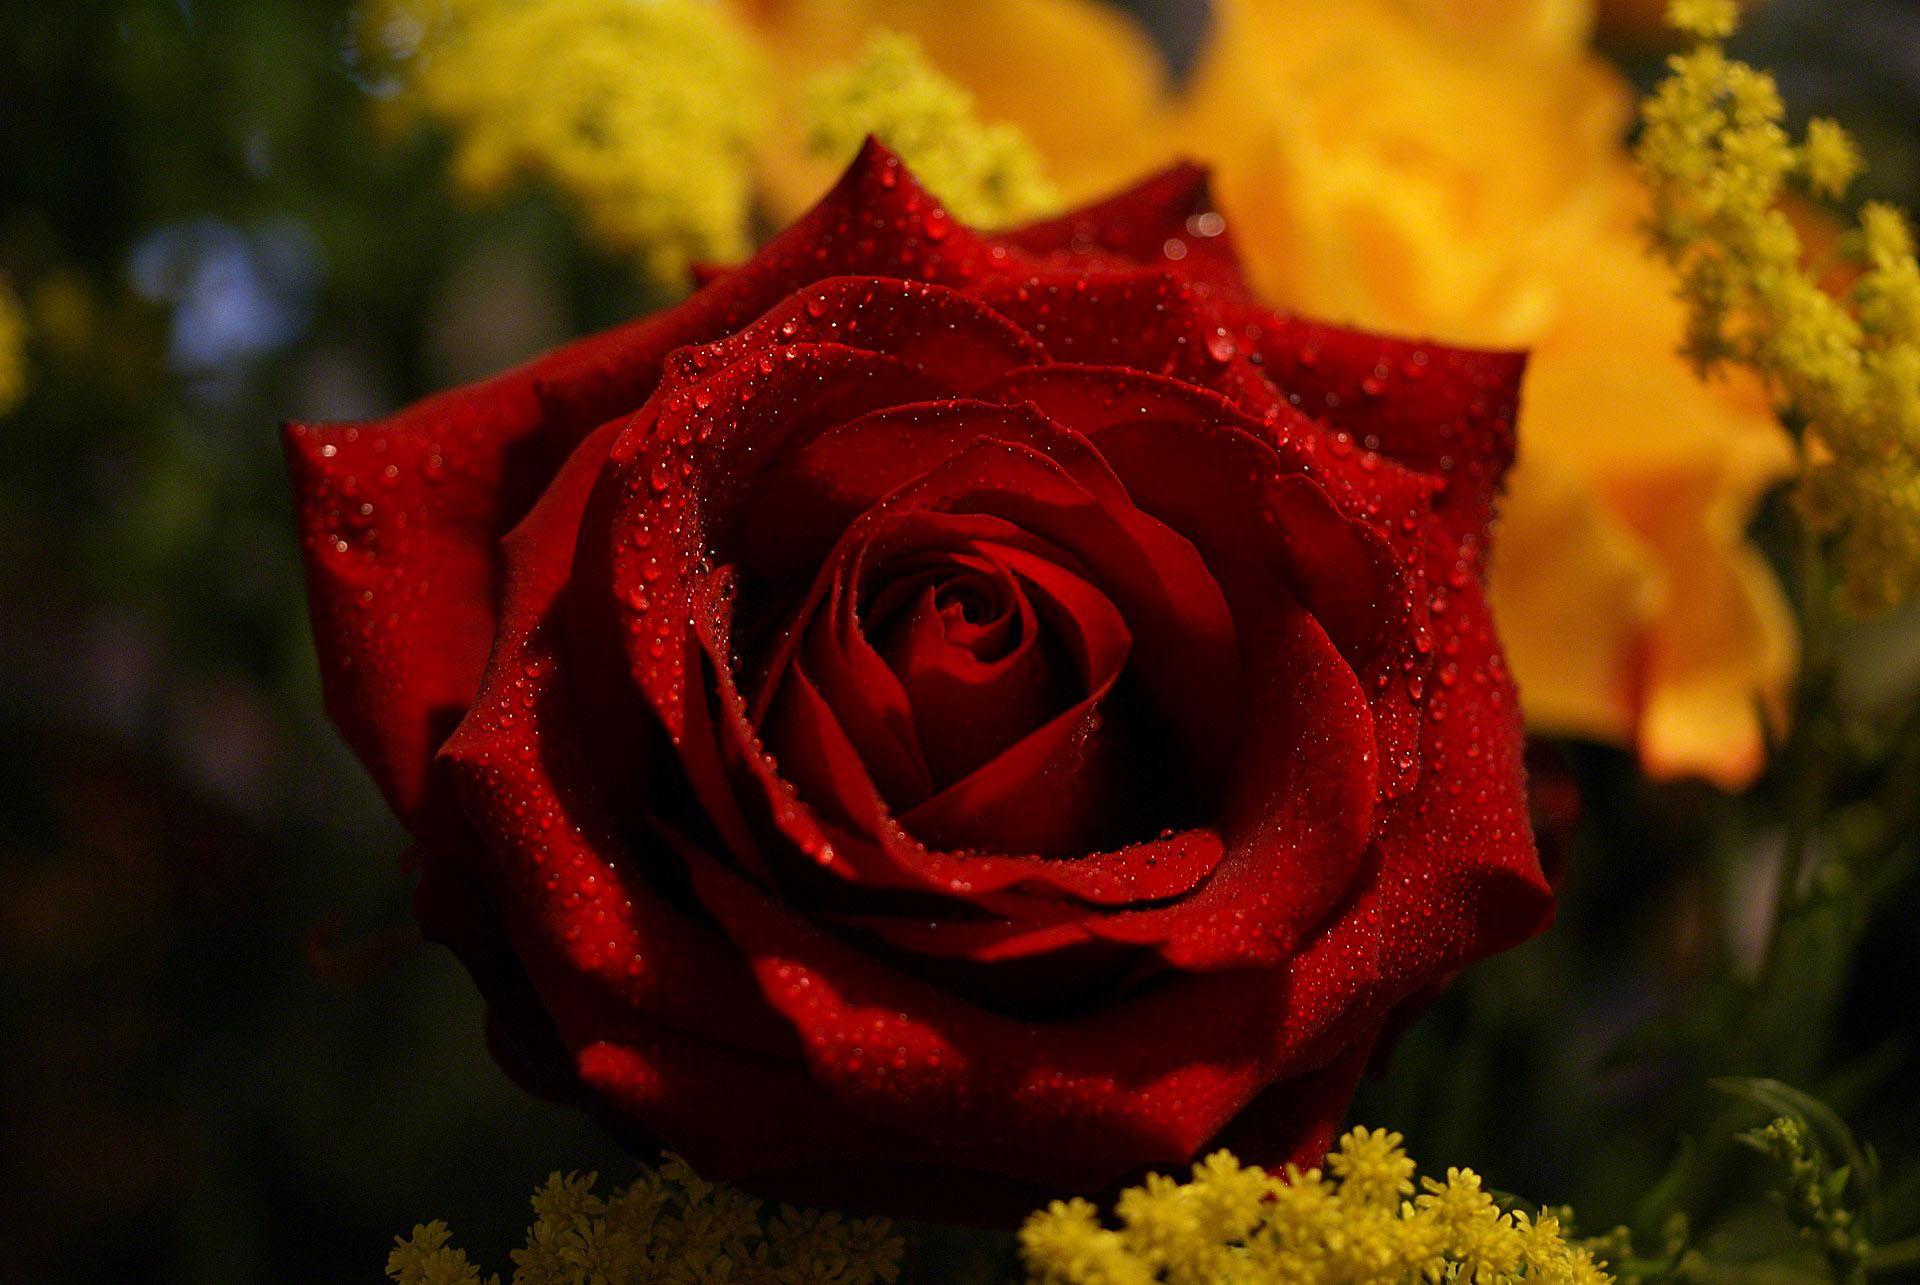 ��� ��� ���� ����� 2016 , ���� ������ ��� ������� ���� ���� ������ ���� Rosa damascena 2015_1402011361_952.